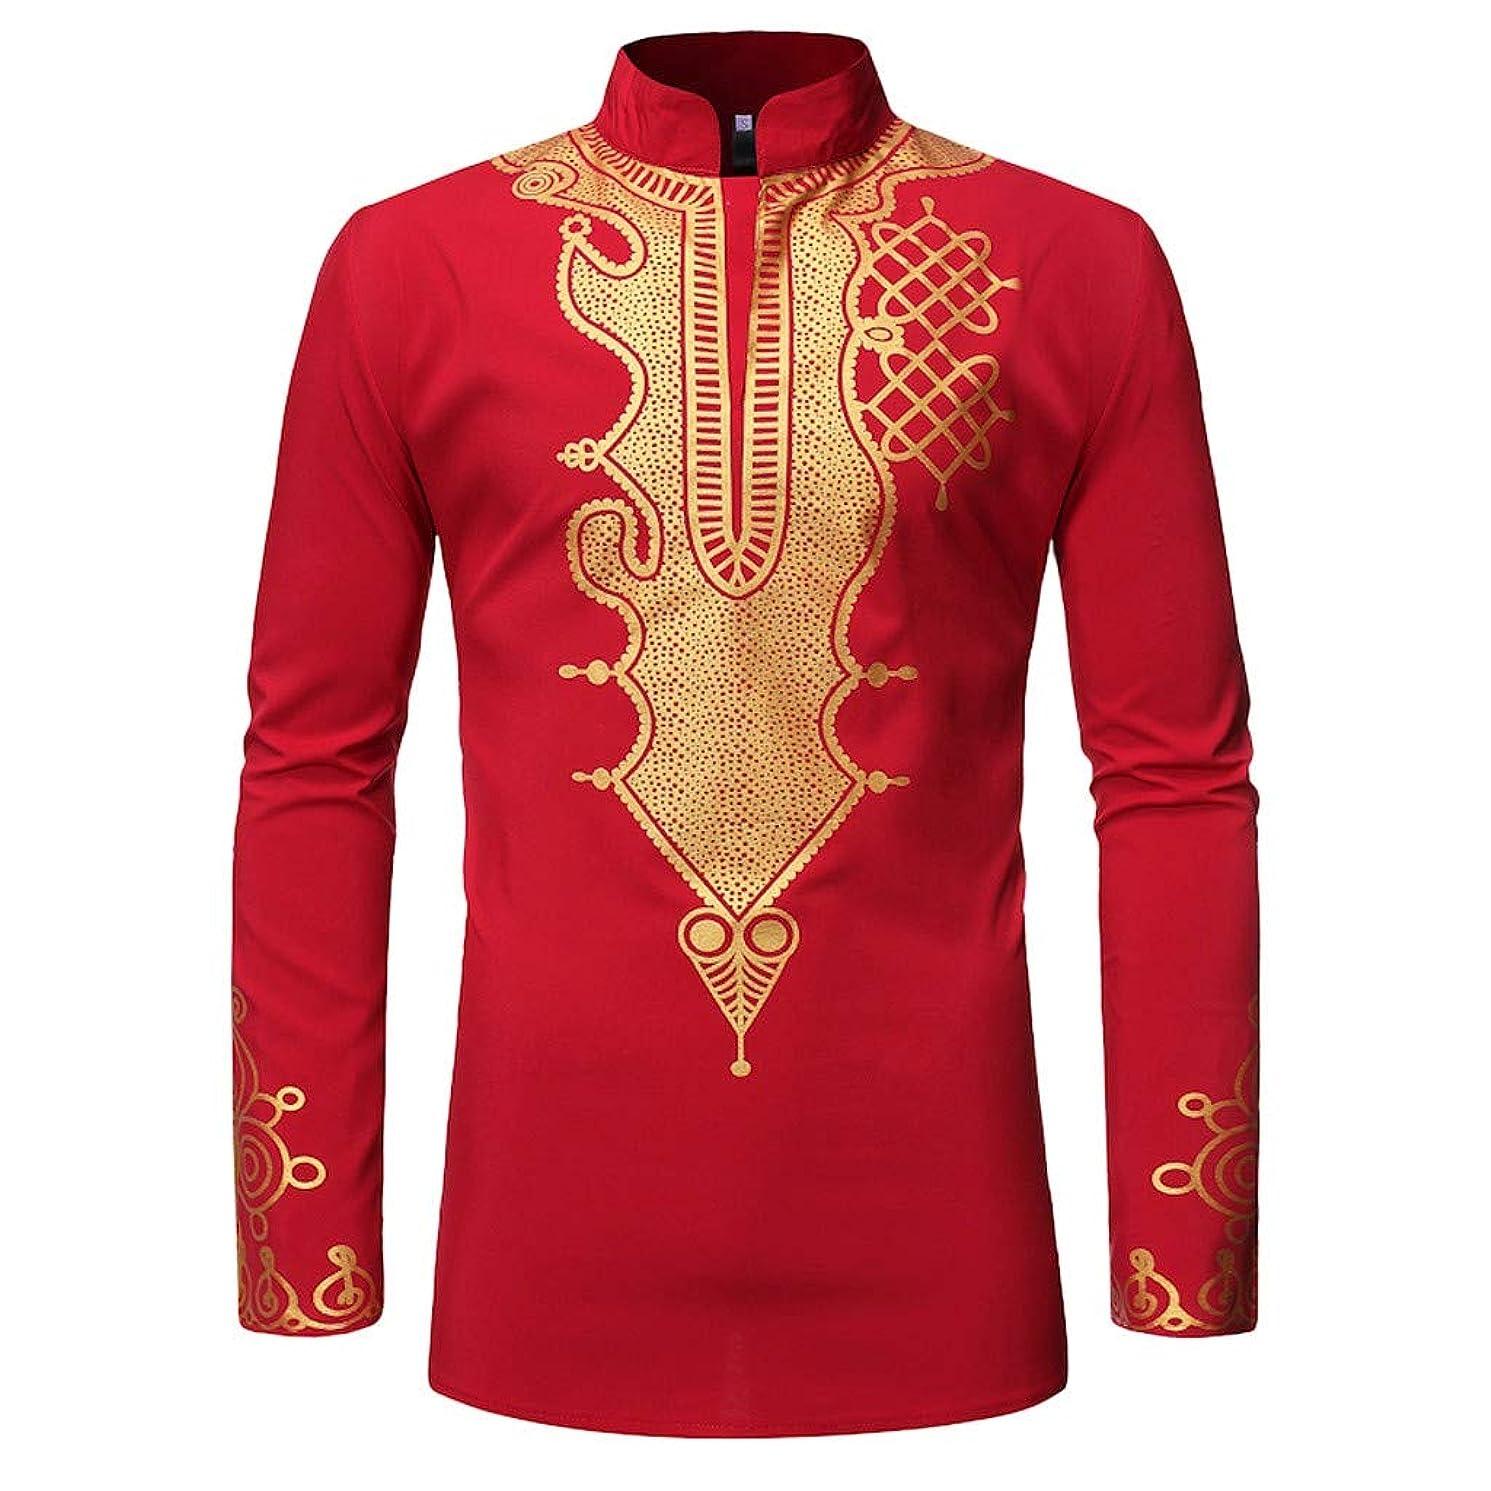 JJLIKER Mens African Tribal Clothing Printed Floral Henley Shirt Slim Fit Dashiki Tees Long Sleeve Casual Tops Black